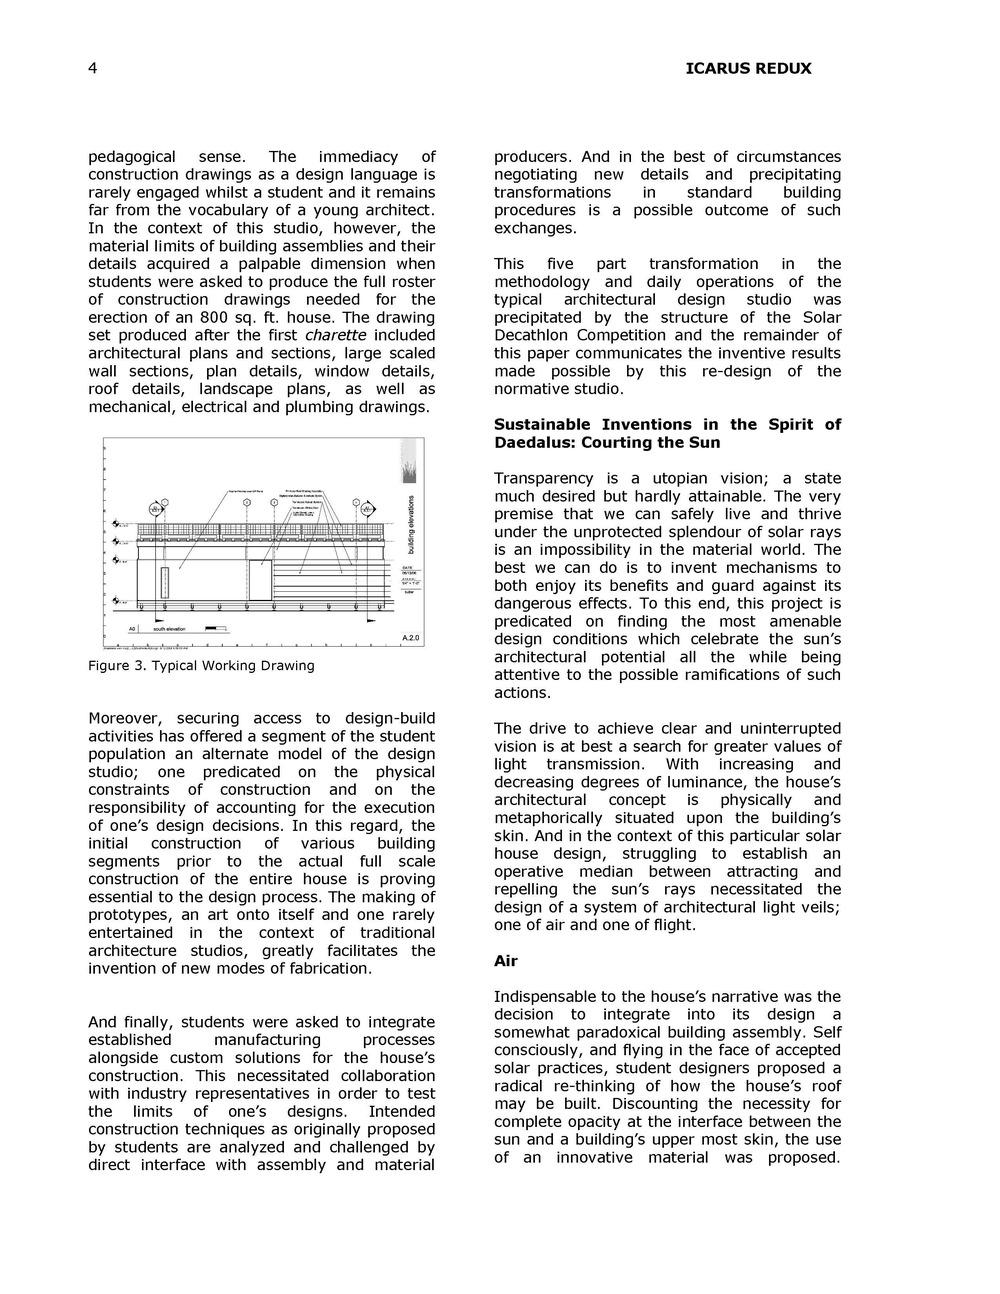 ACSA.2007.IcarusRedux2_Page_4.jpg